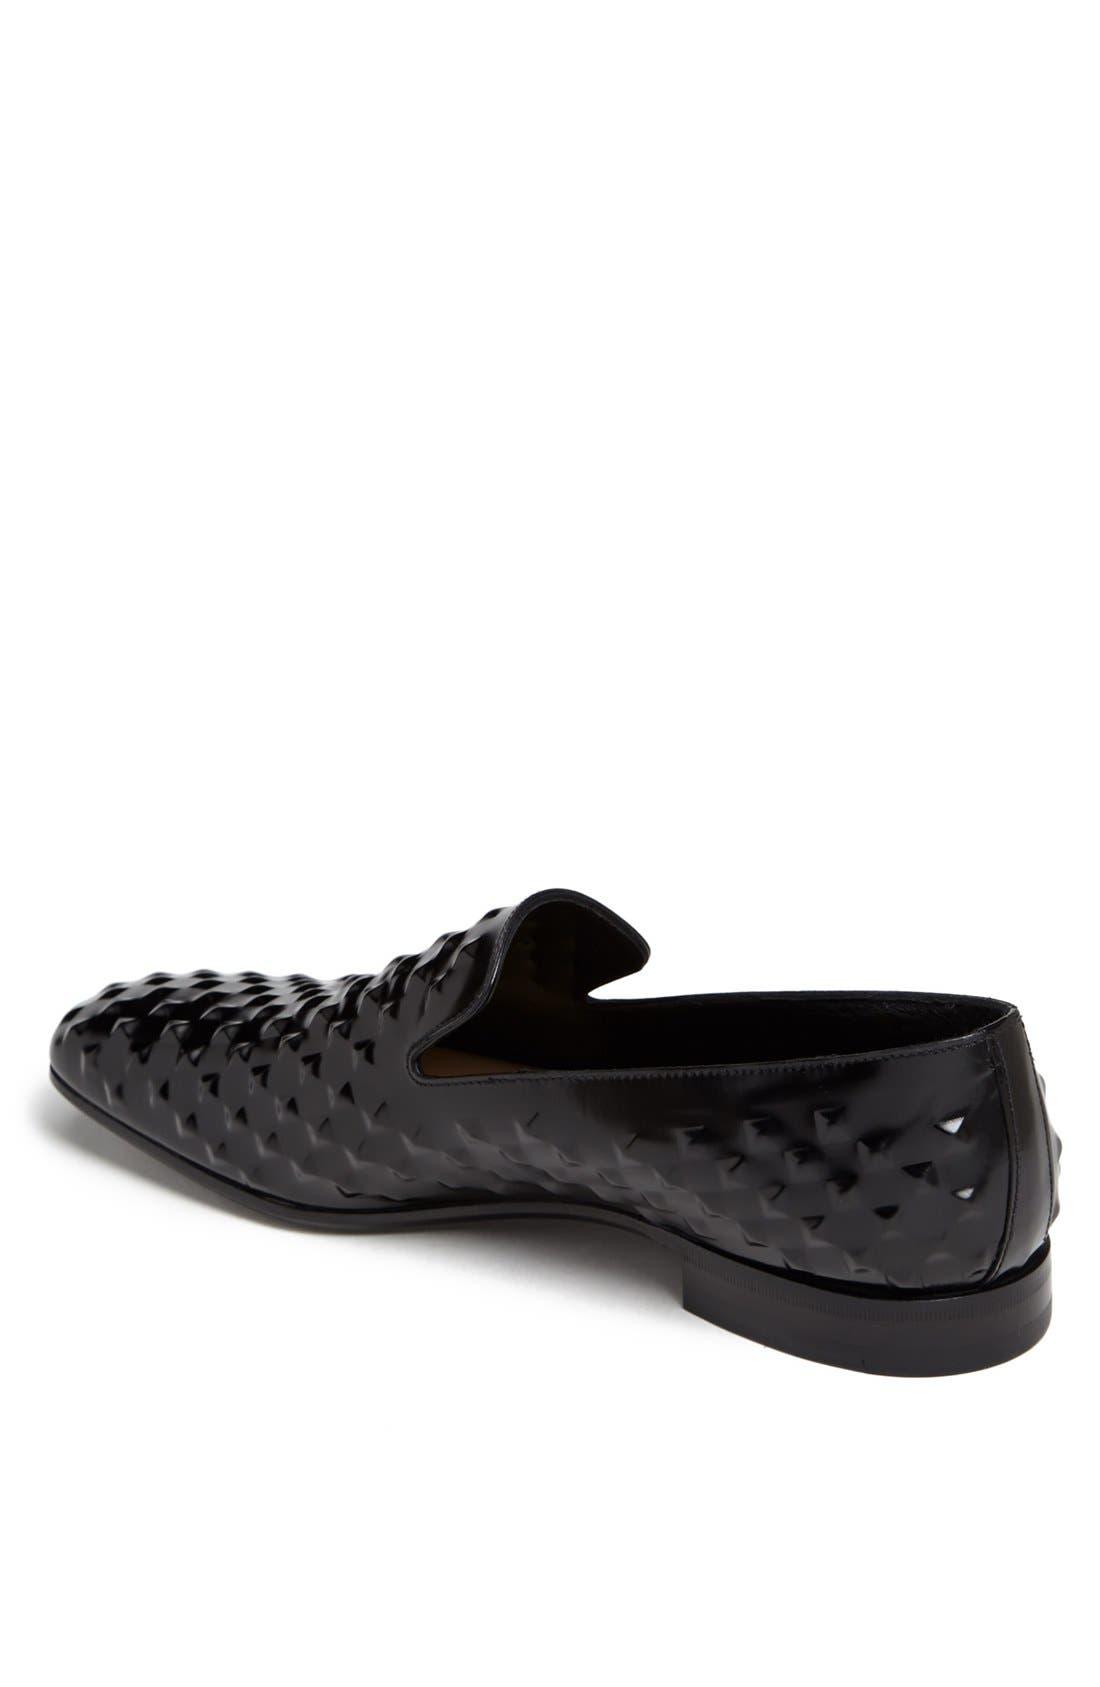 Alternate Image 2  - Prada Studded Loafer